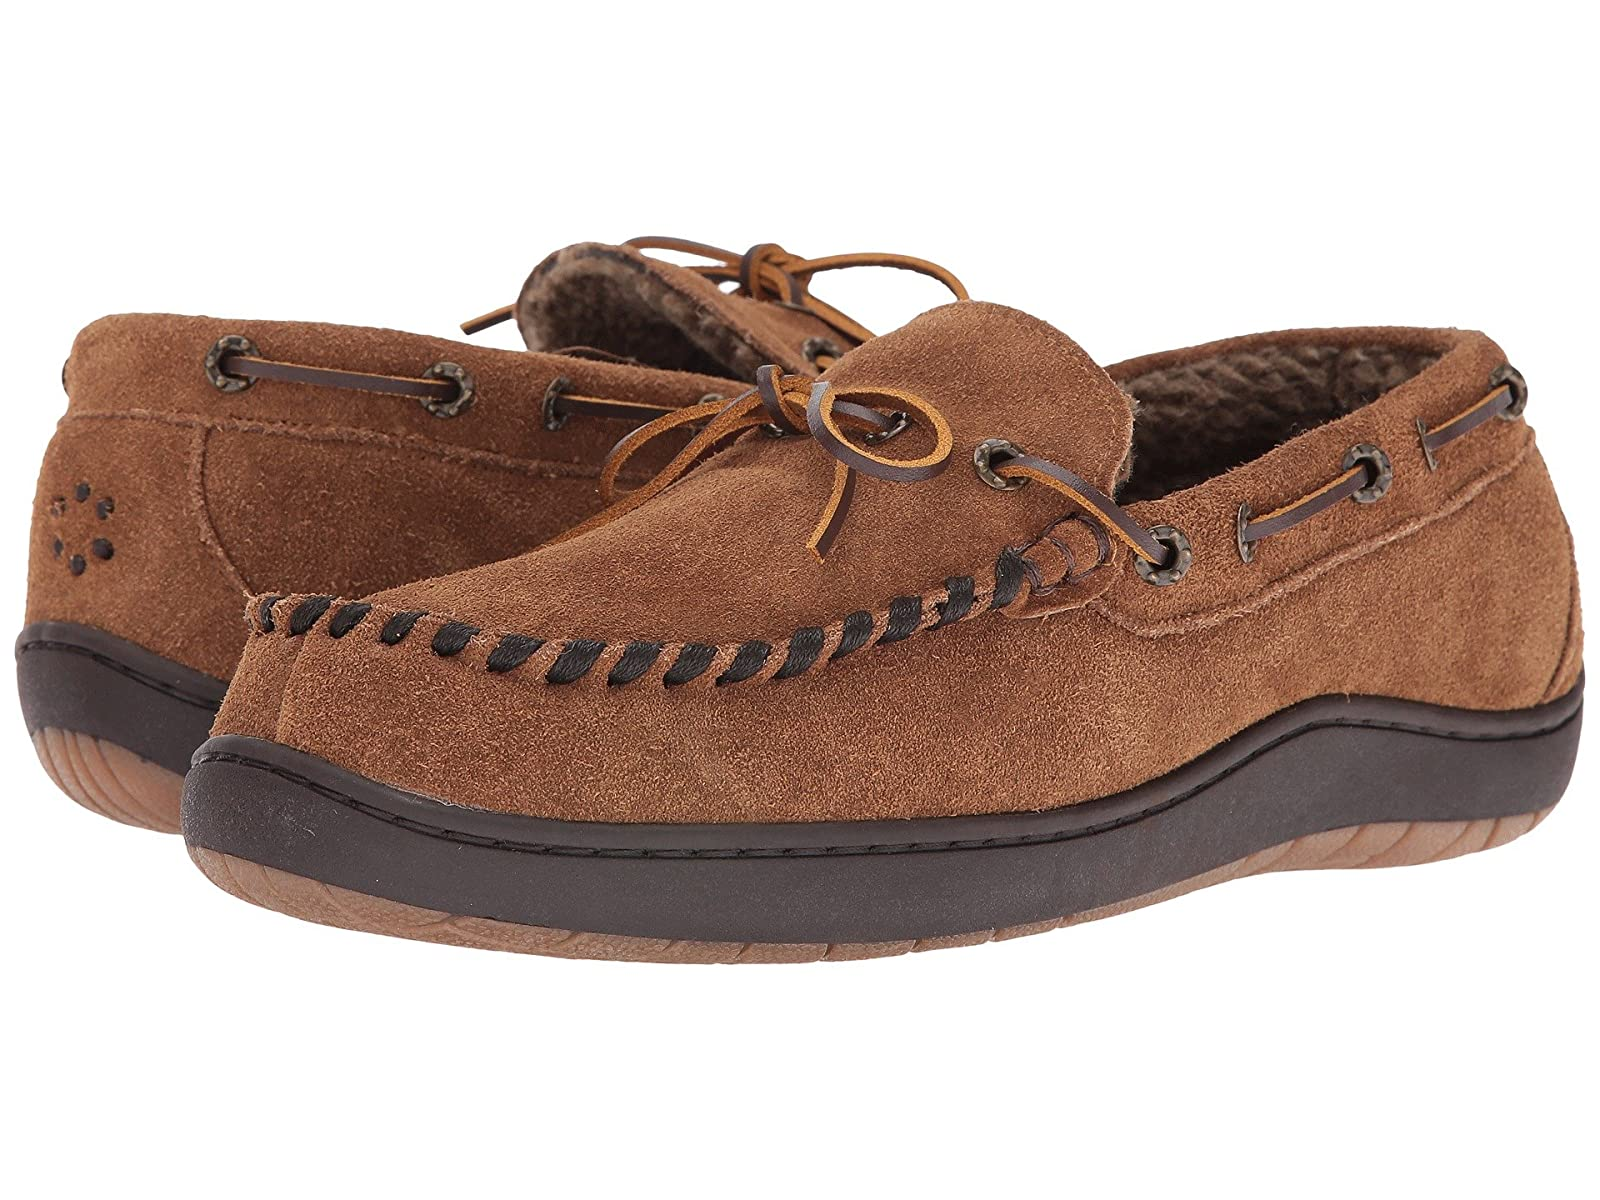 Tempur-Pedic ThermanAtmospheric grades have affordable shoes